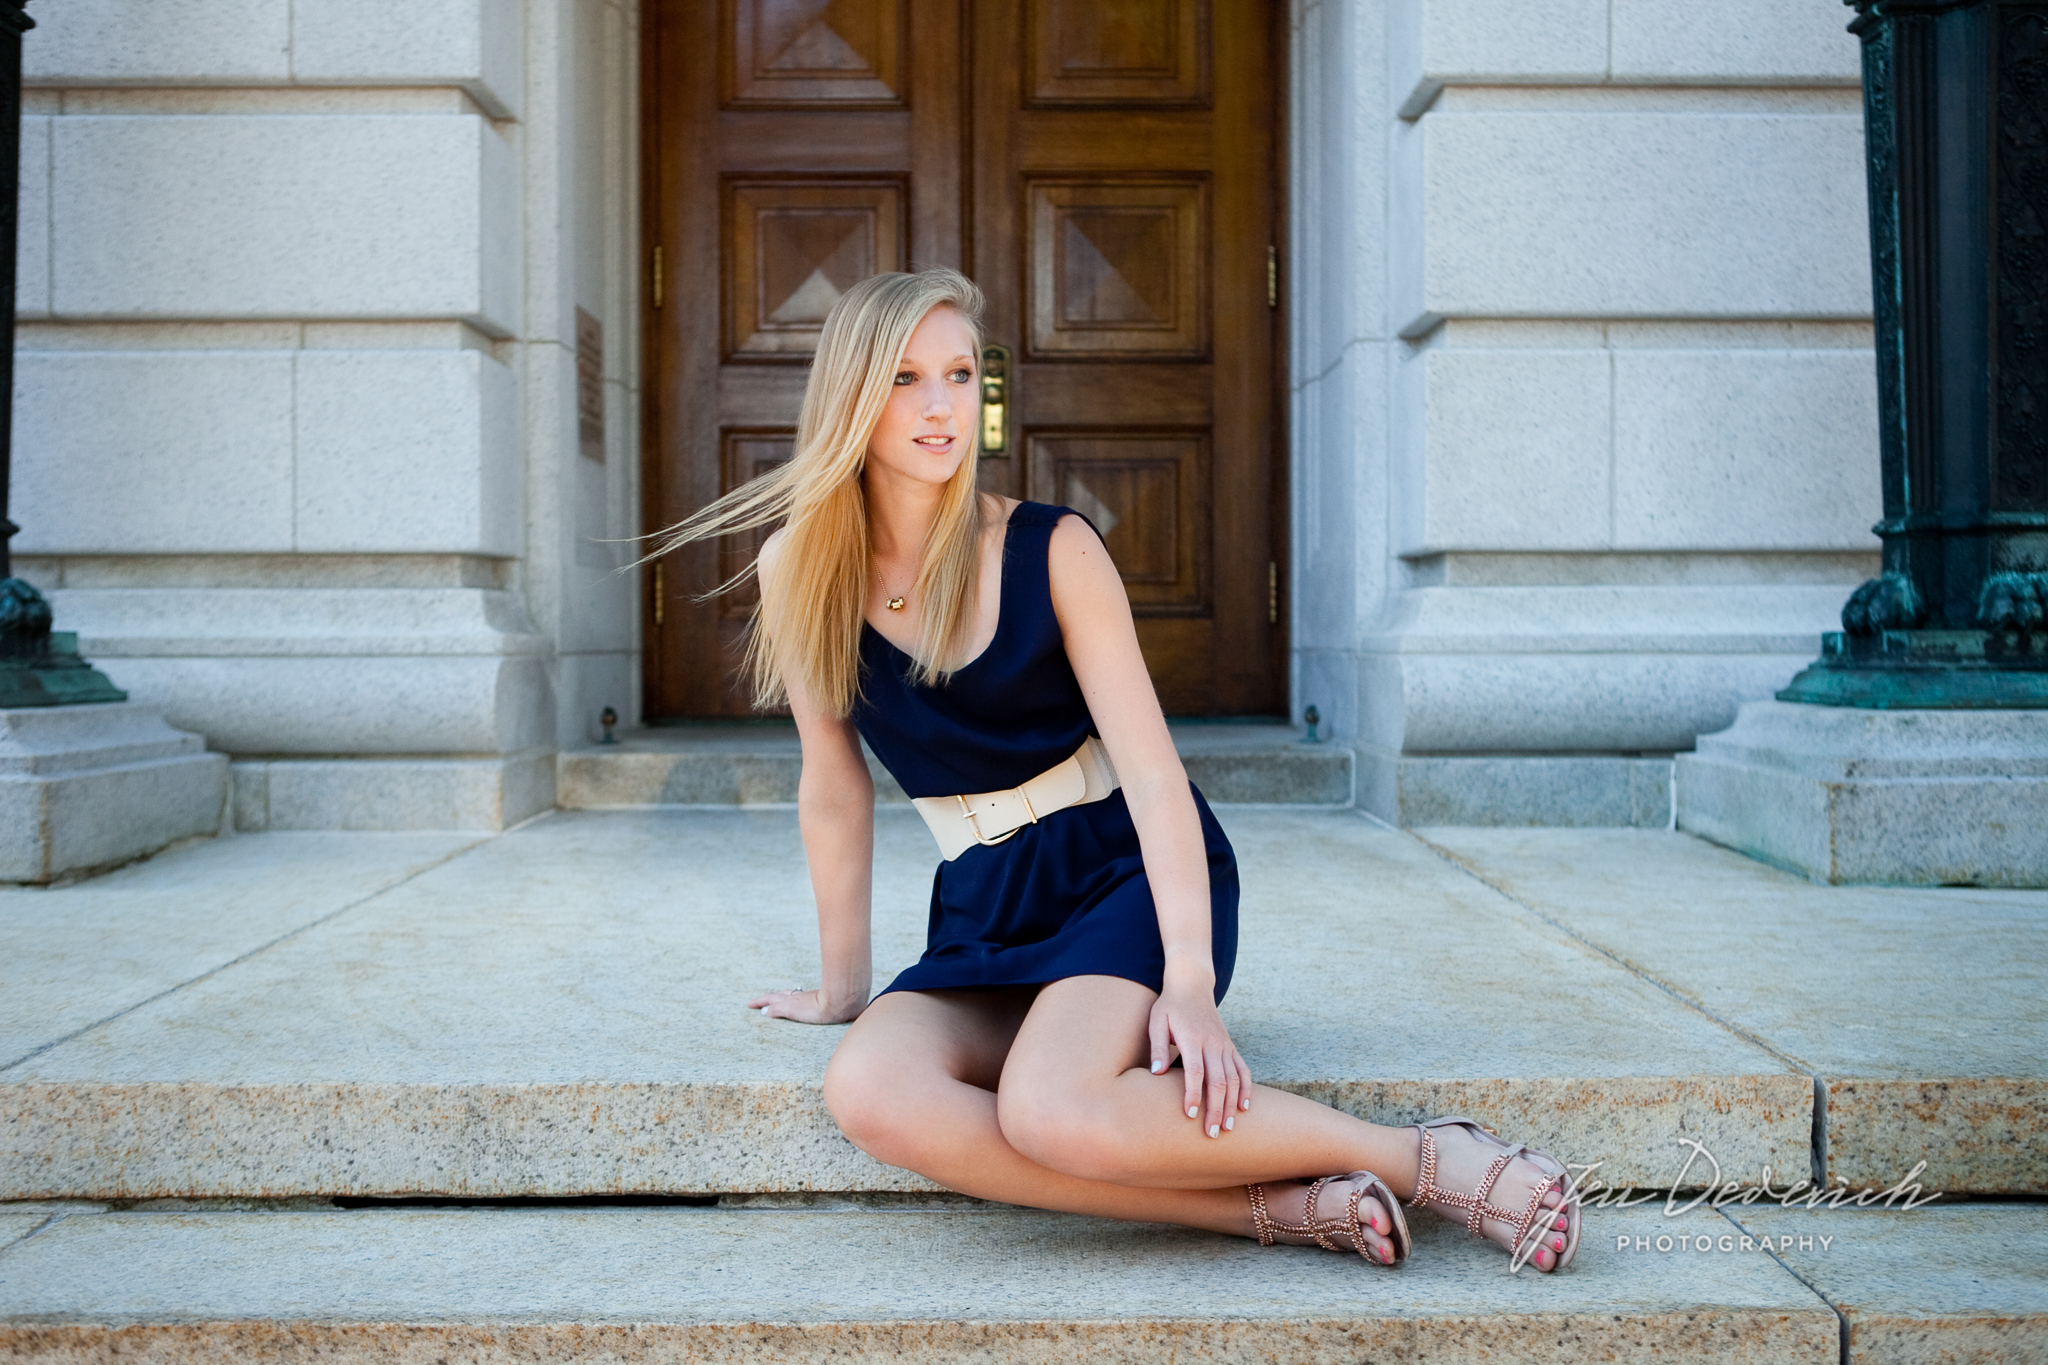 Senior_Madison WI_Jen Dederich Photography_003.jpg